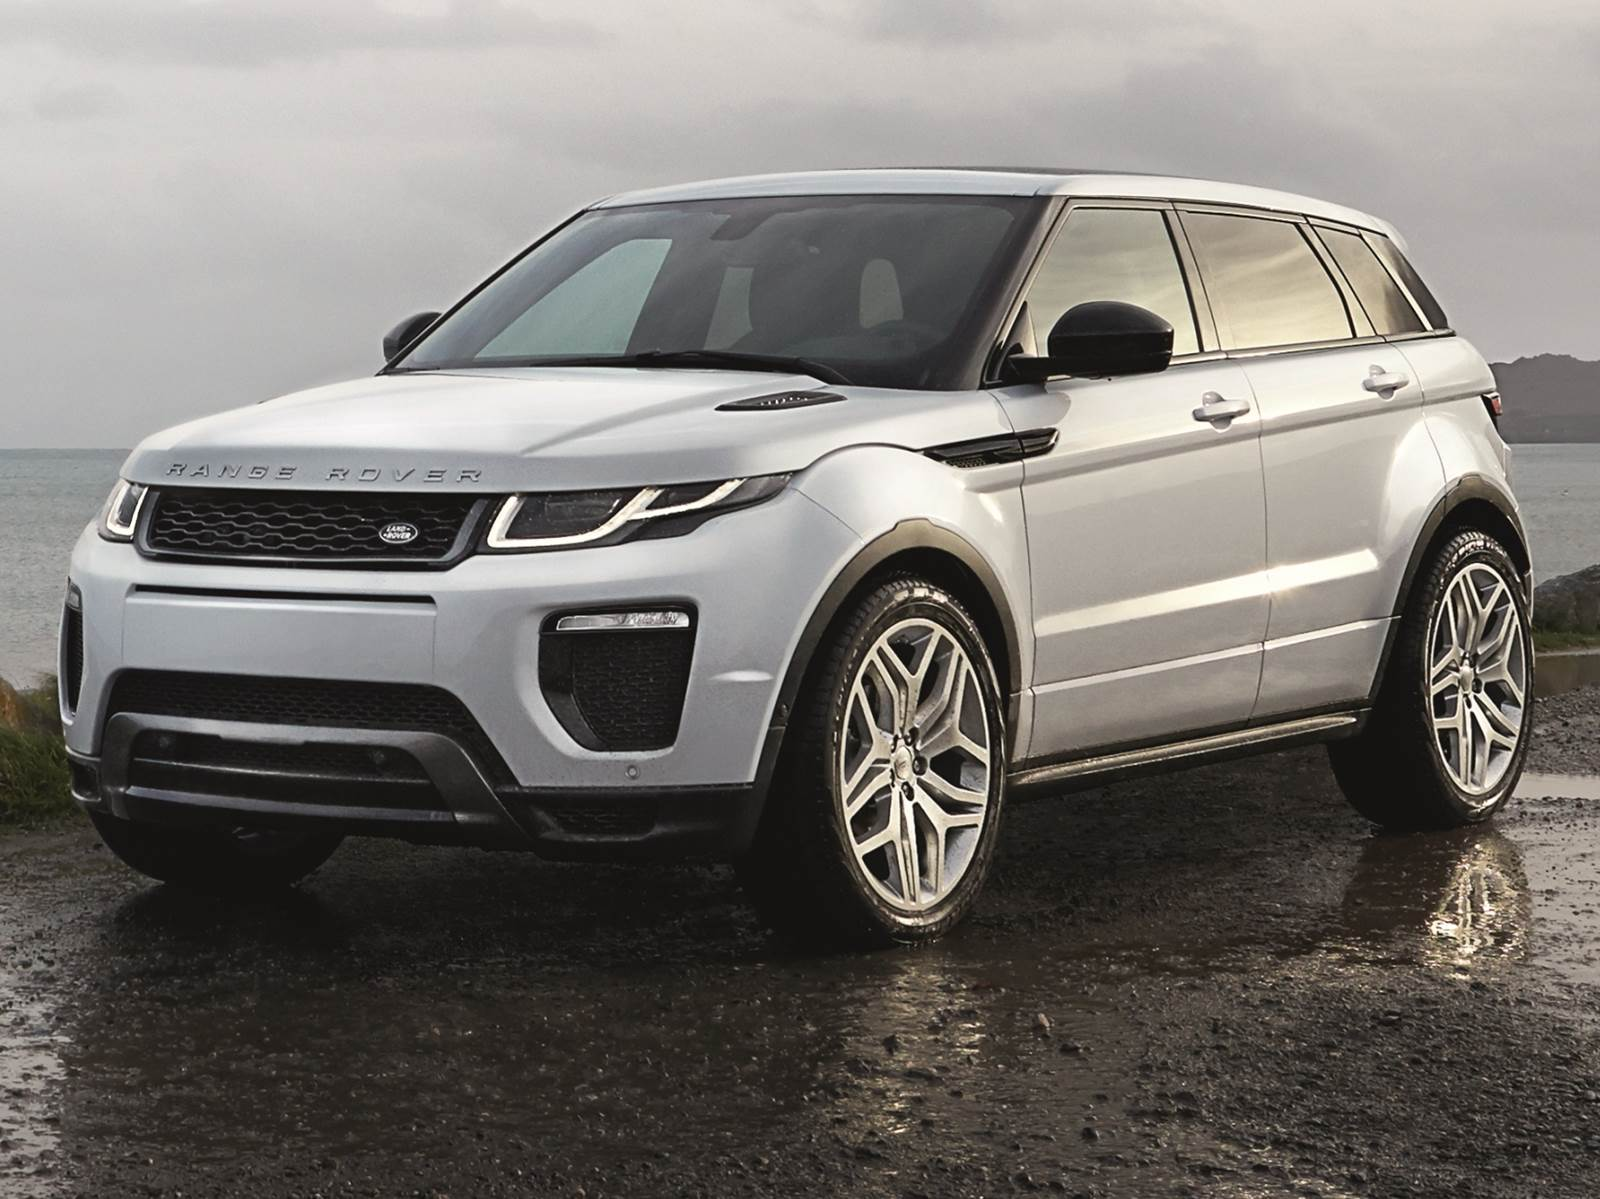 Novo Range Rover Evoque 2016